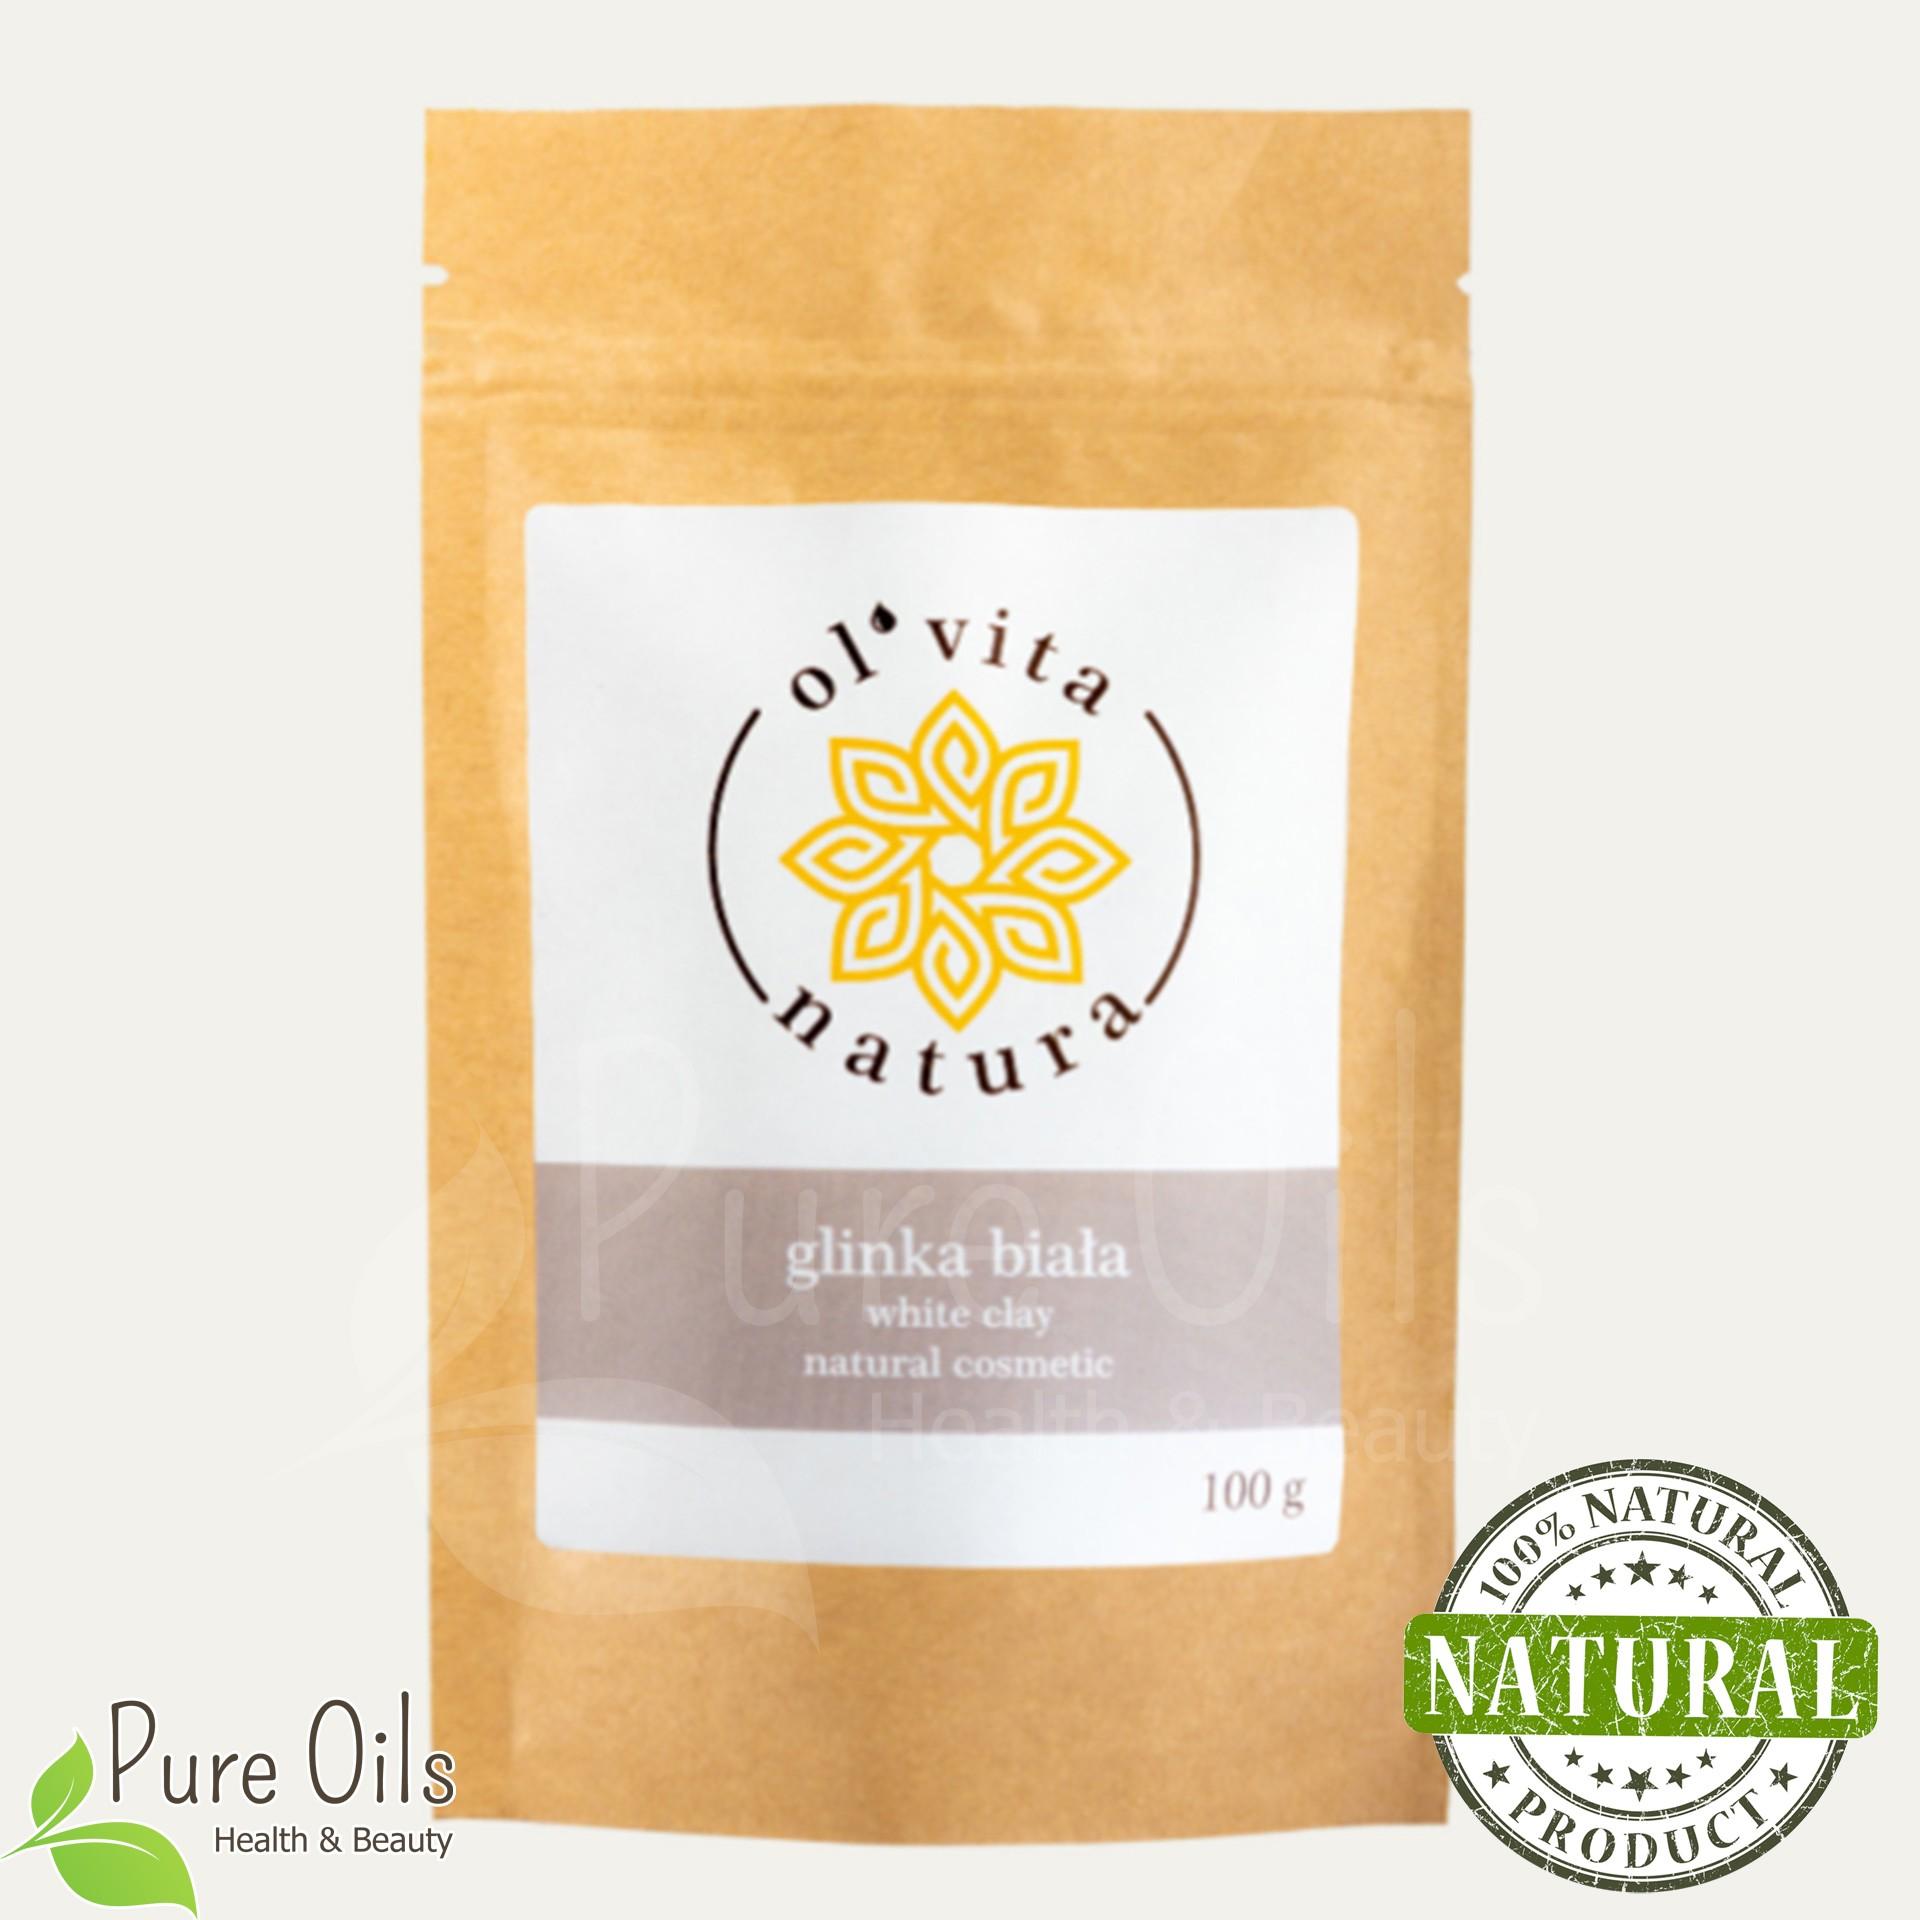 White Clay - Natural organic cosmetic, Ol'Vita 100 g - label